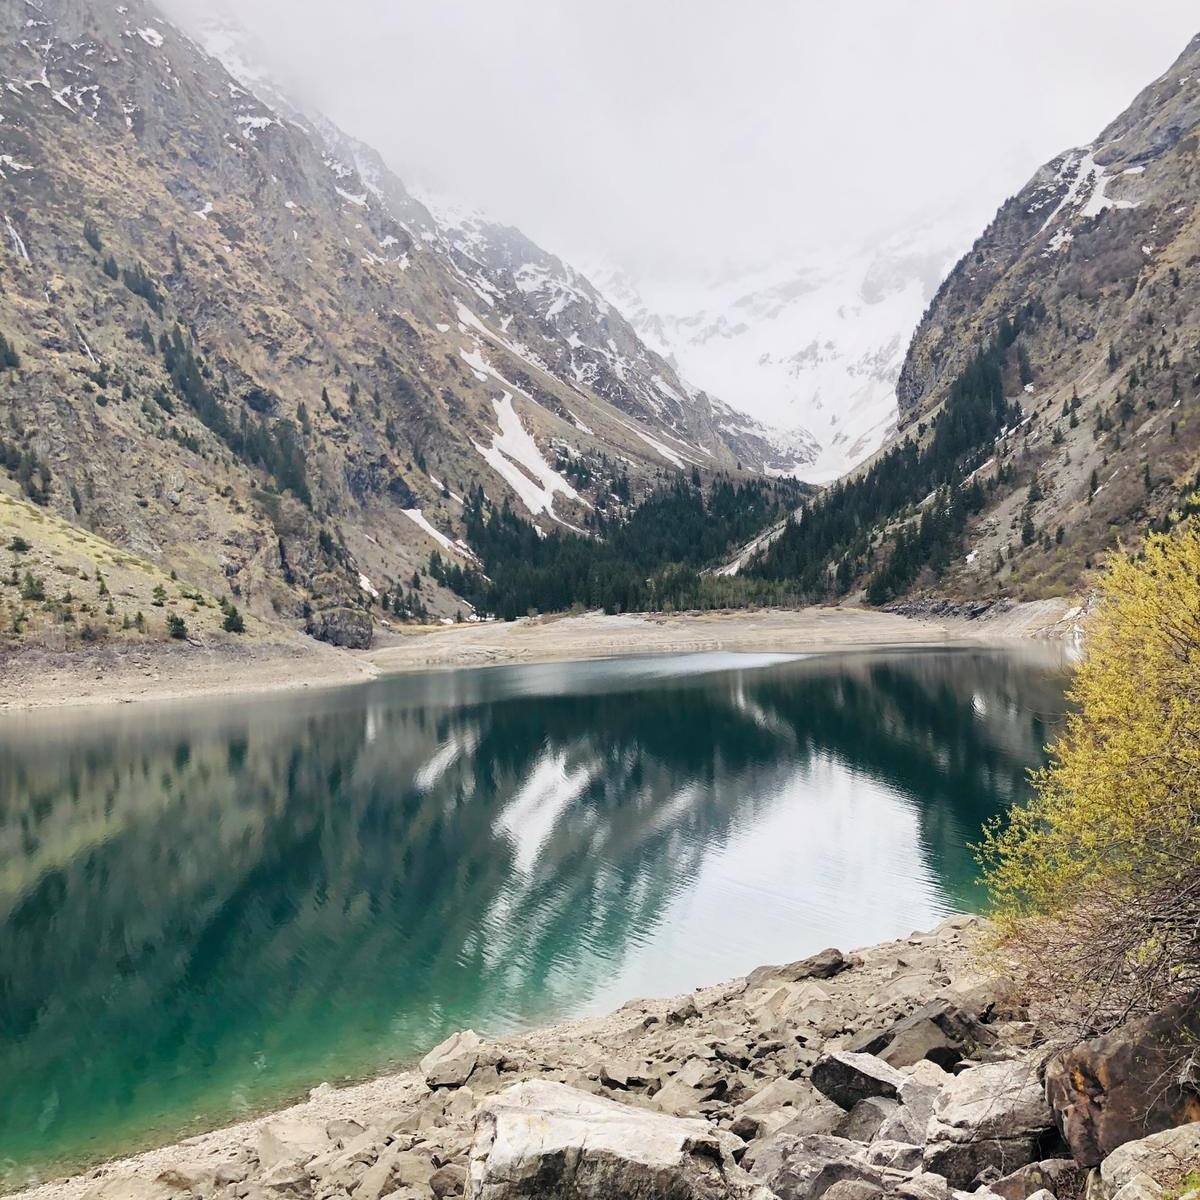 lake of Lauvitel